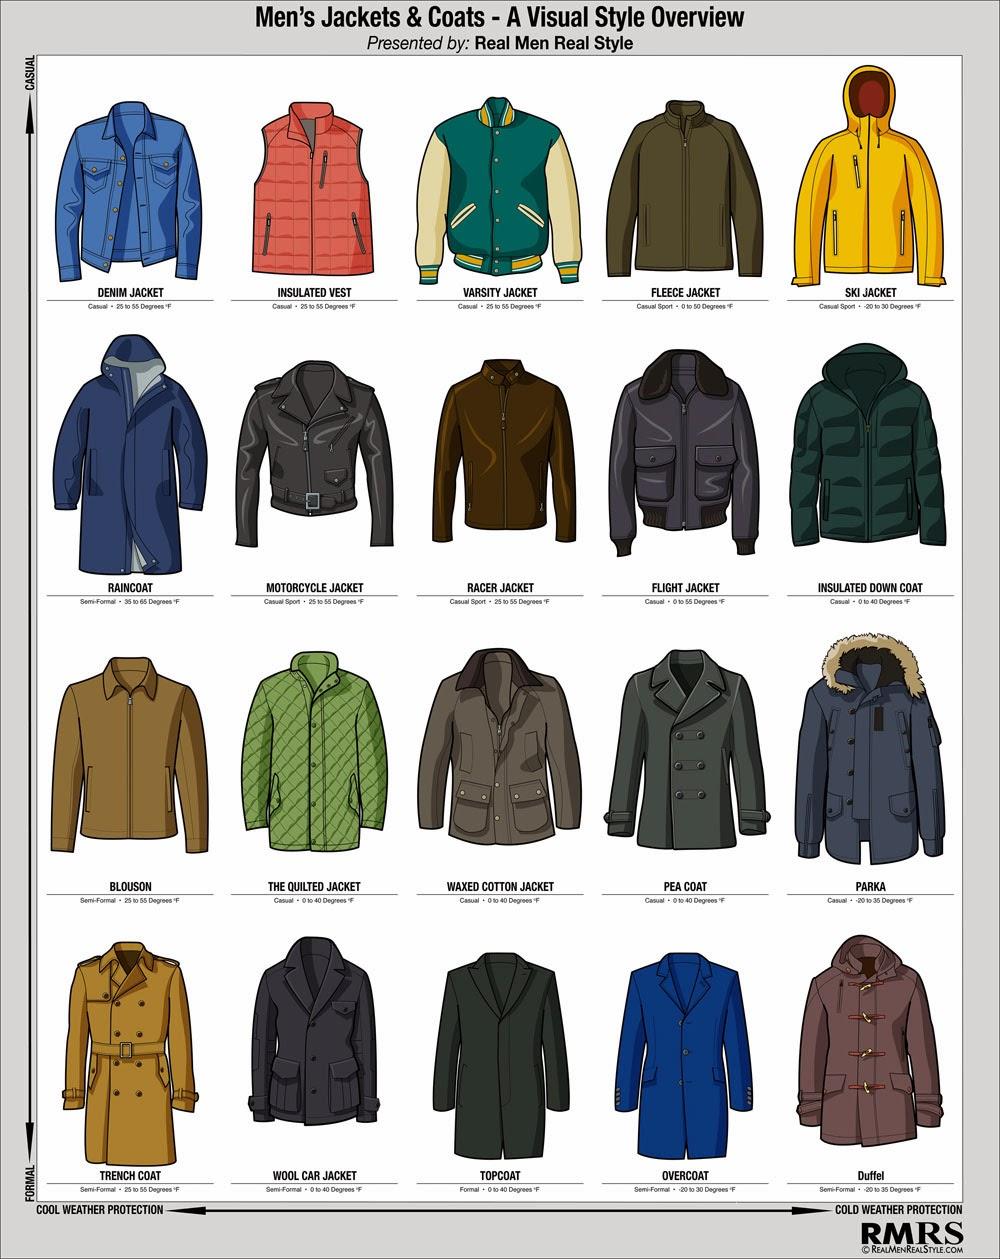 Mens jacket names - The Las Vegas Gentleman Men S Winter Jackets Coats The Las Vegas Gentleman Men S Winter Jackets Coats